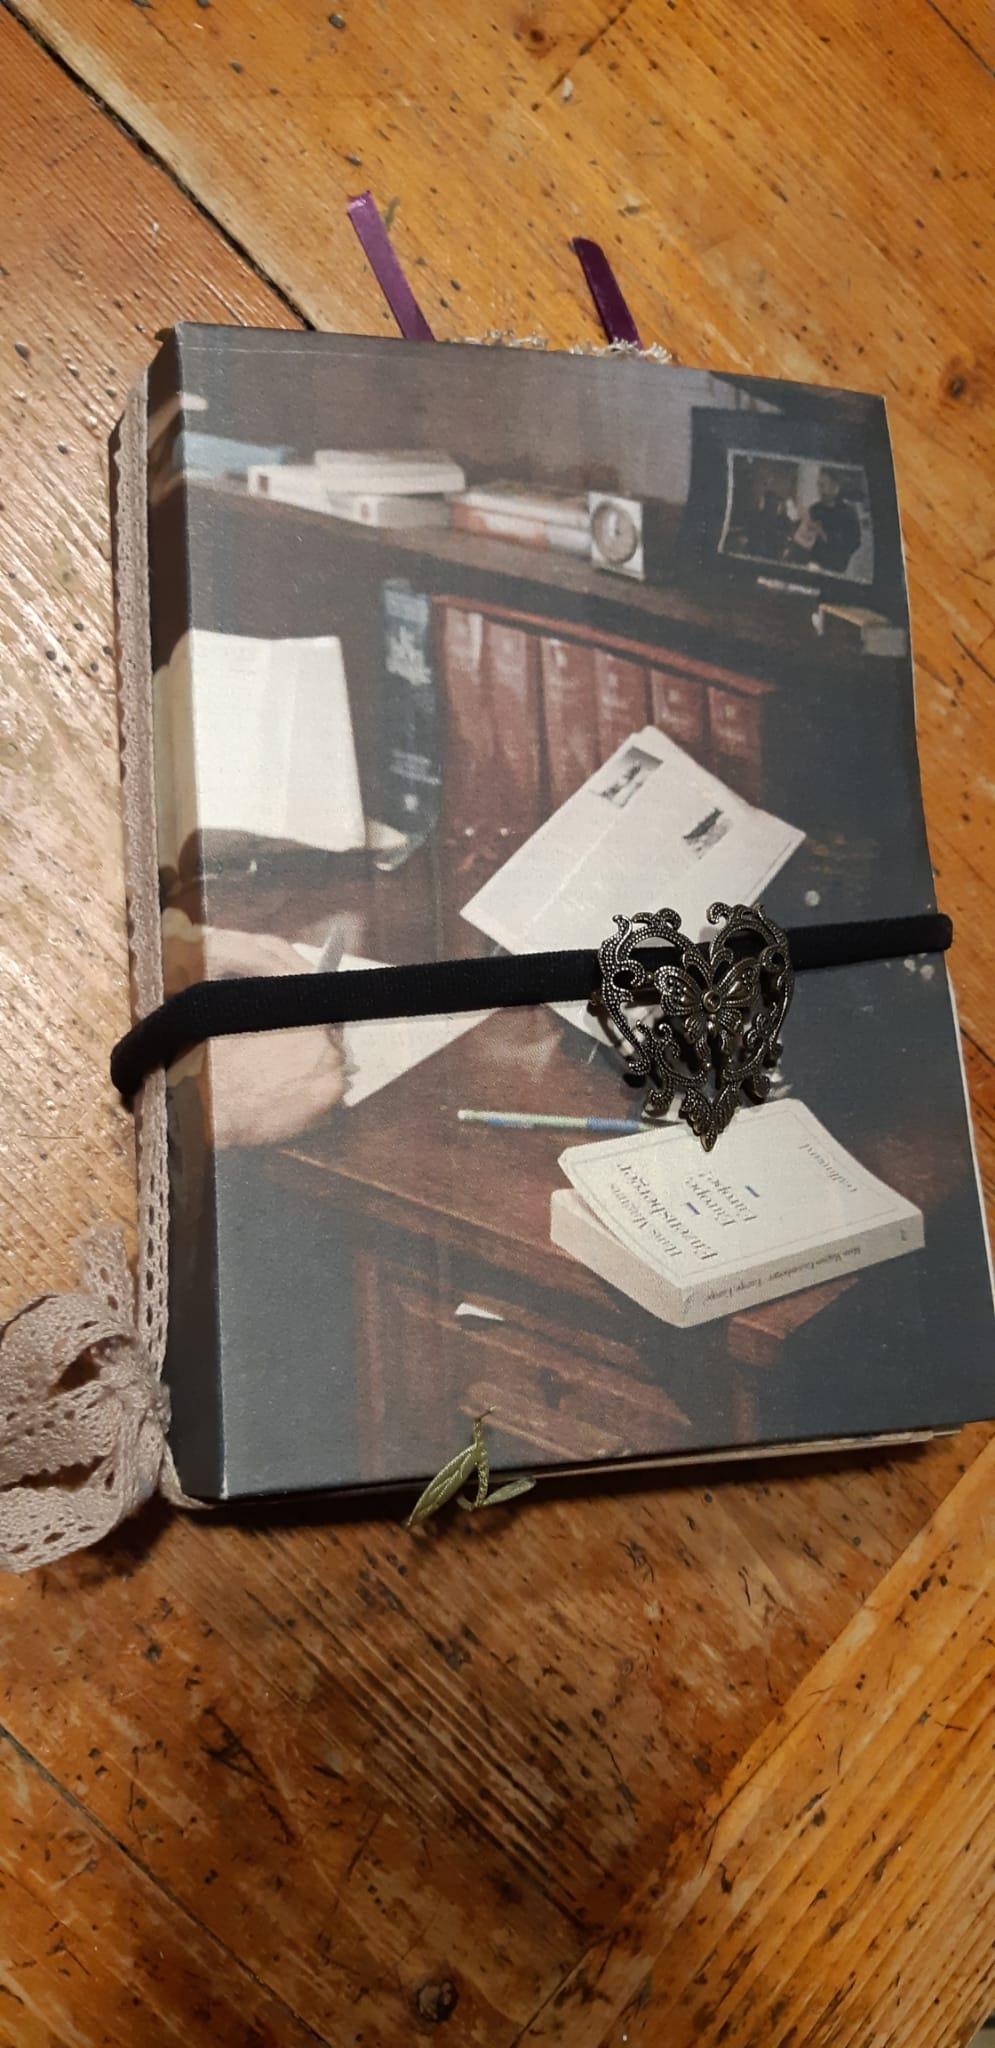 Junk Journal: memories - image 7 - student project